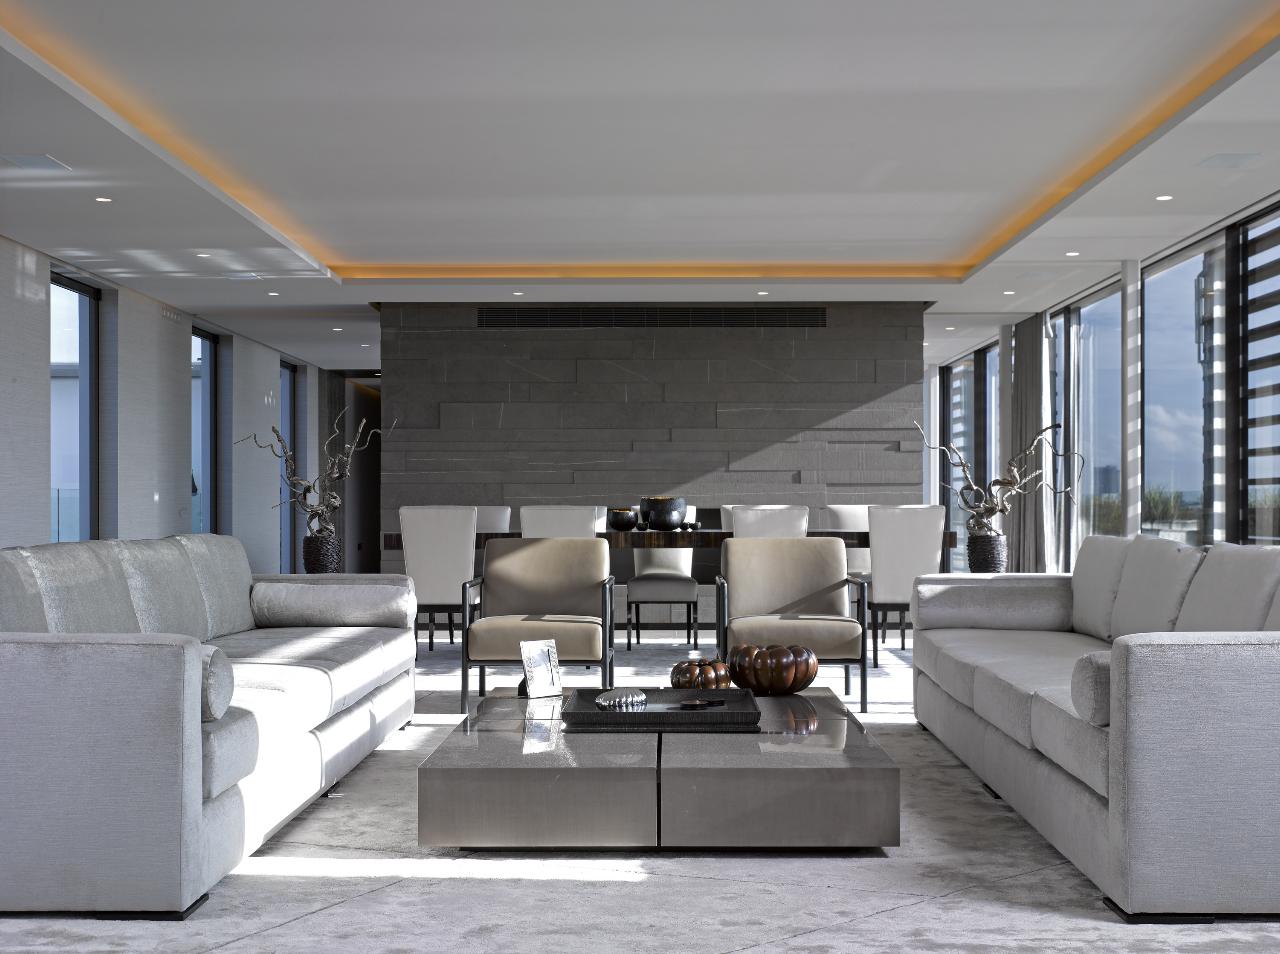 kibre ltd living room design ideas PNEQDGX